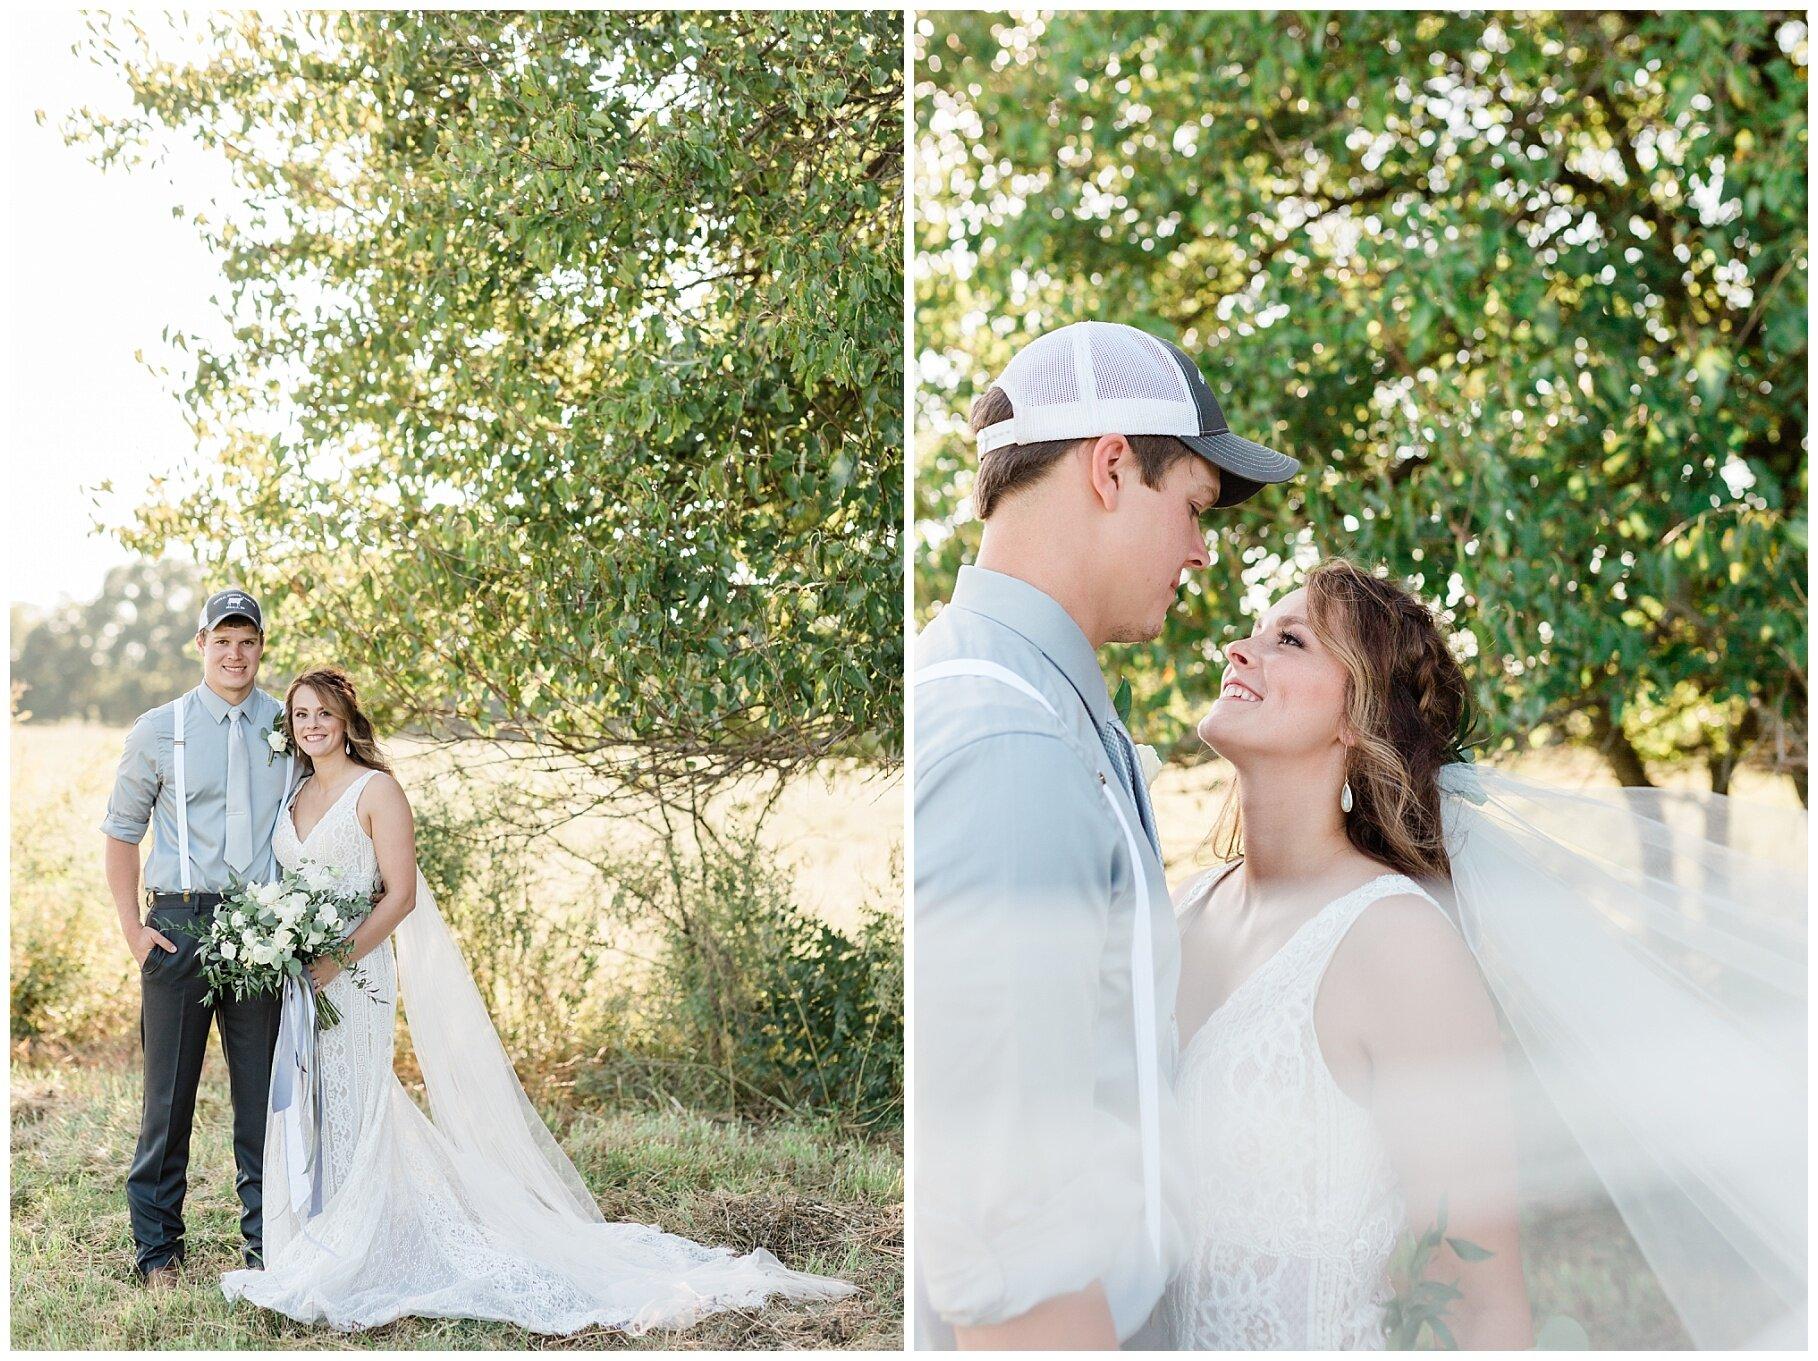 Earth-Toned Wedding by KKP Associate Wedding Photographer and Kelsi Kliethermes Photography Best Columbia Missouri Wedding Photographer_0034.jpg